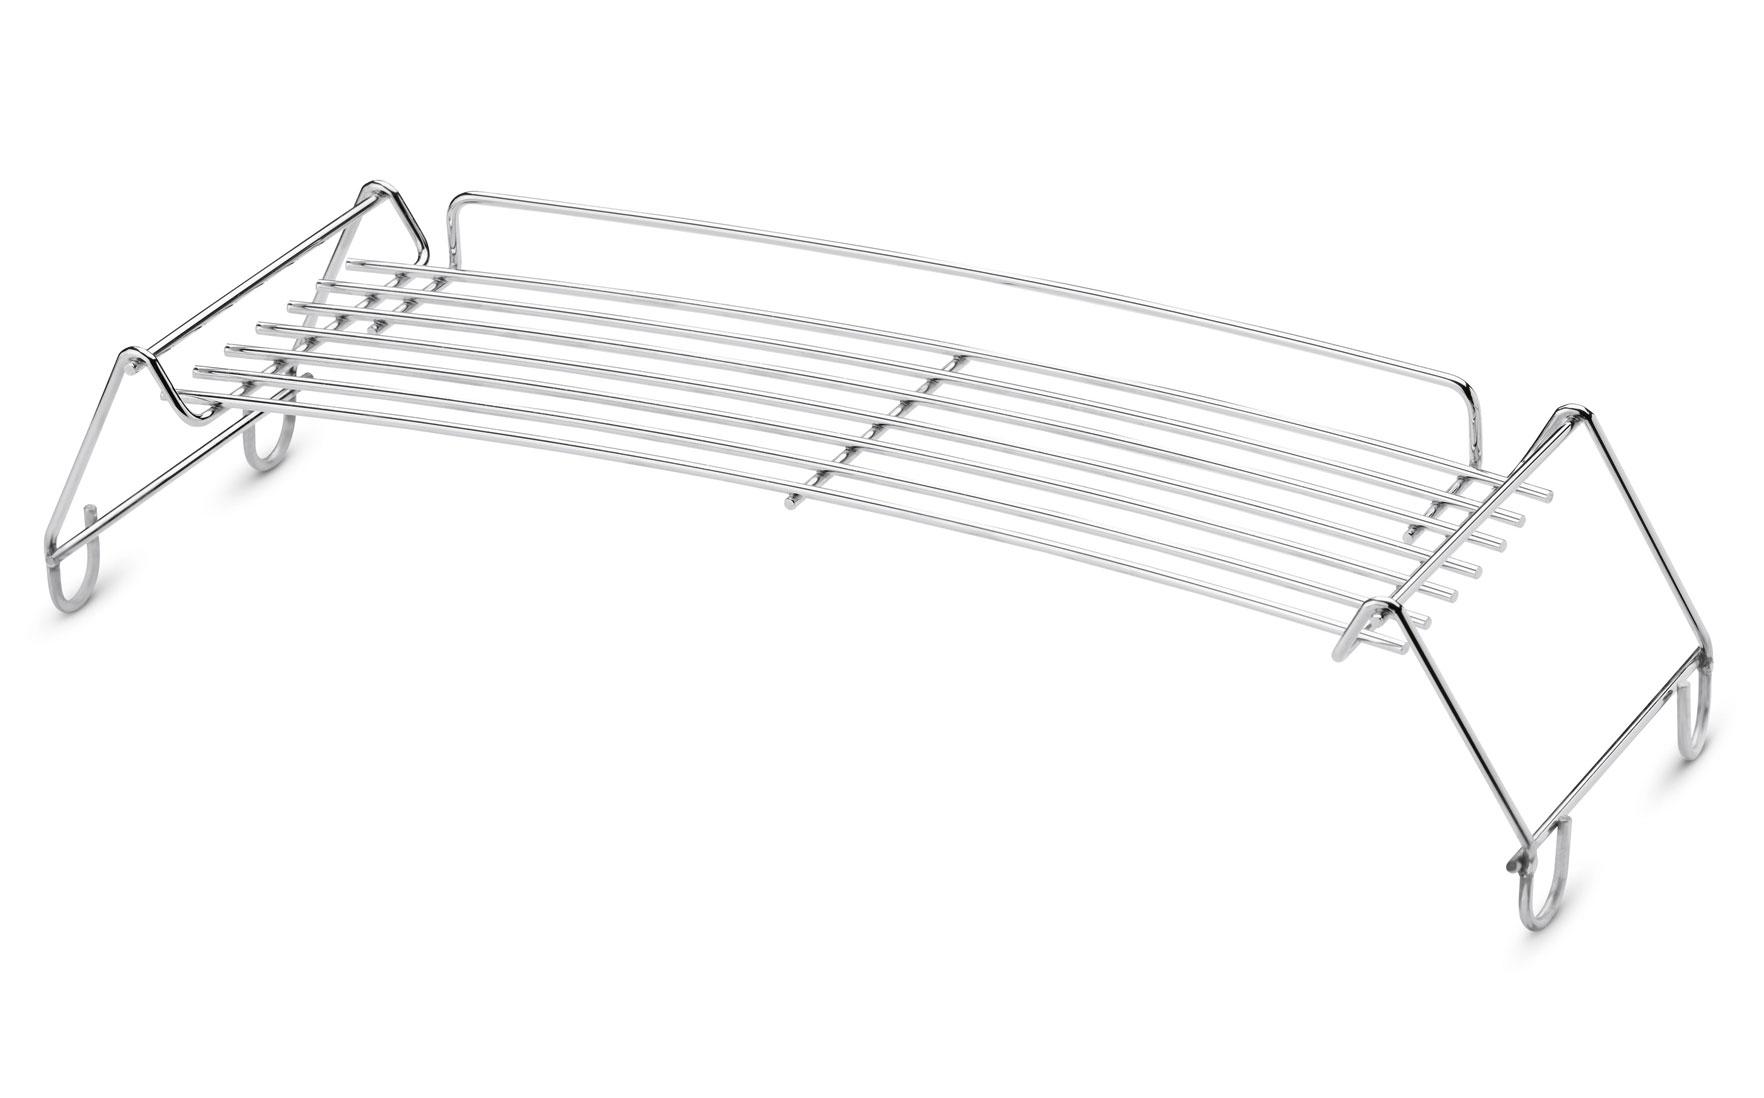 weber warmhalterost f r q3000 serie bei. Black Bedroom Furniture Sets. Home Design Ideas